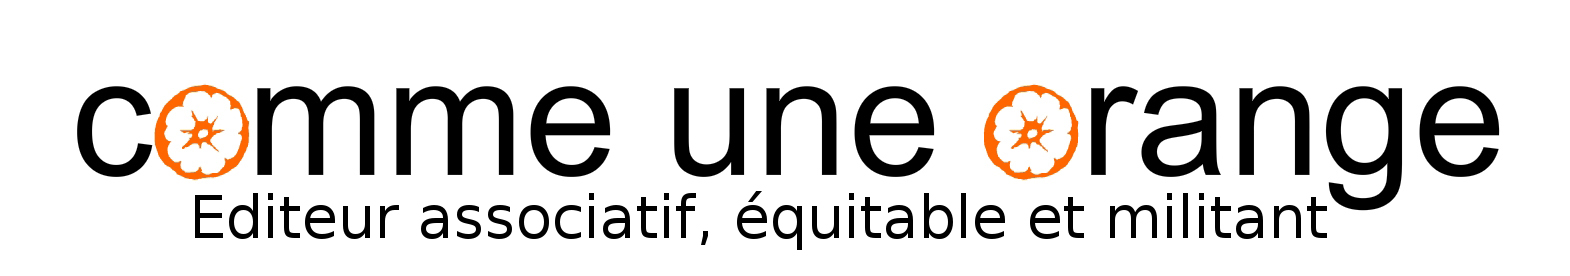 logo banniere